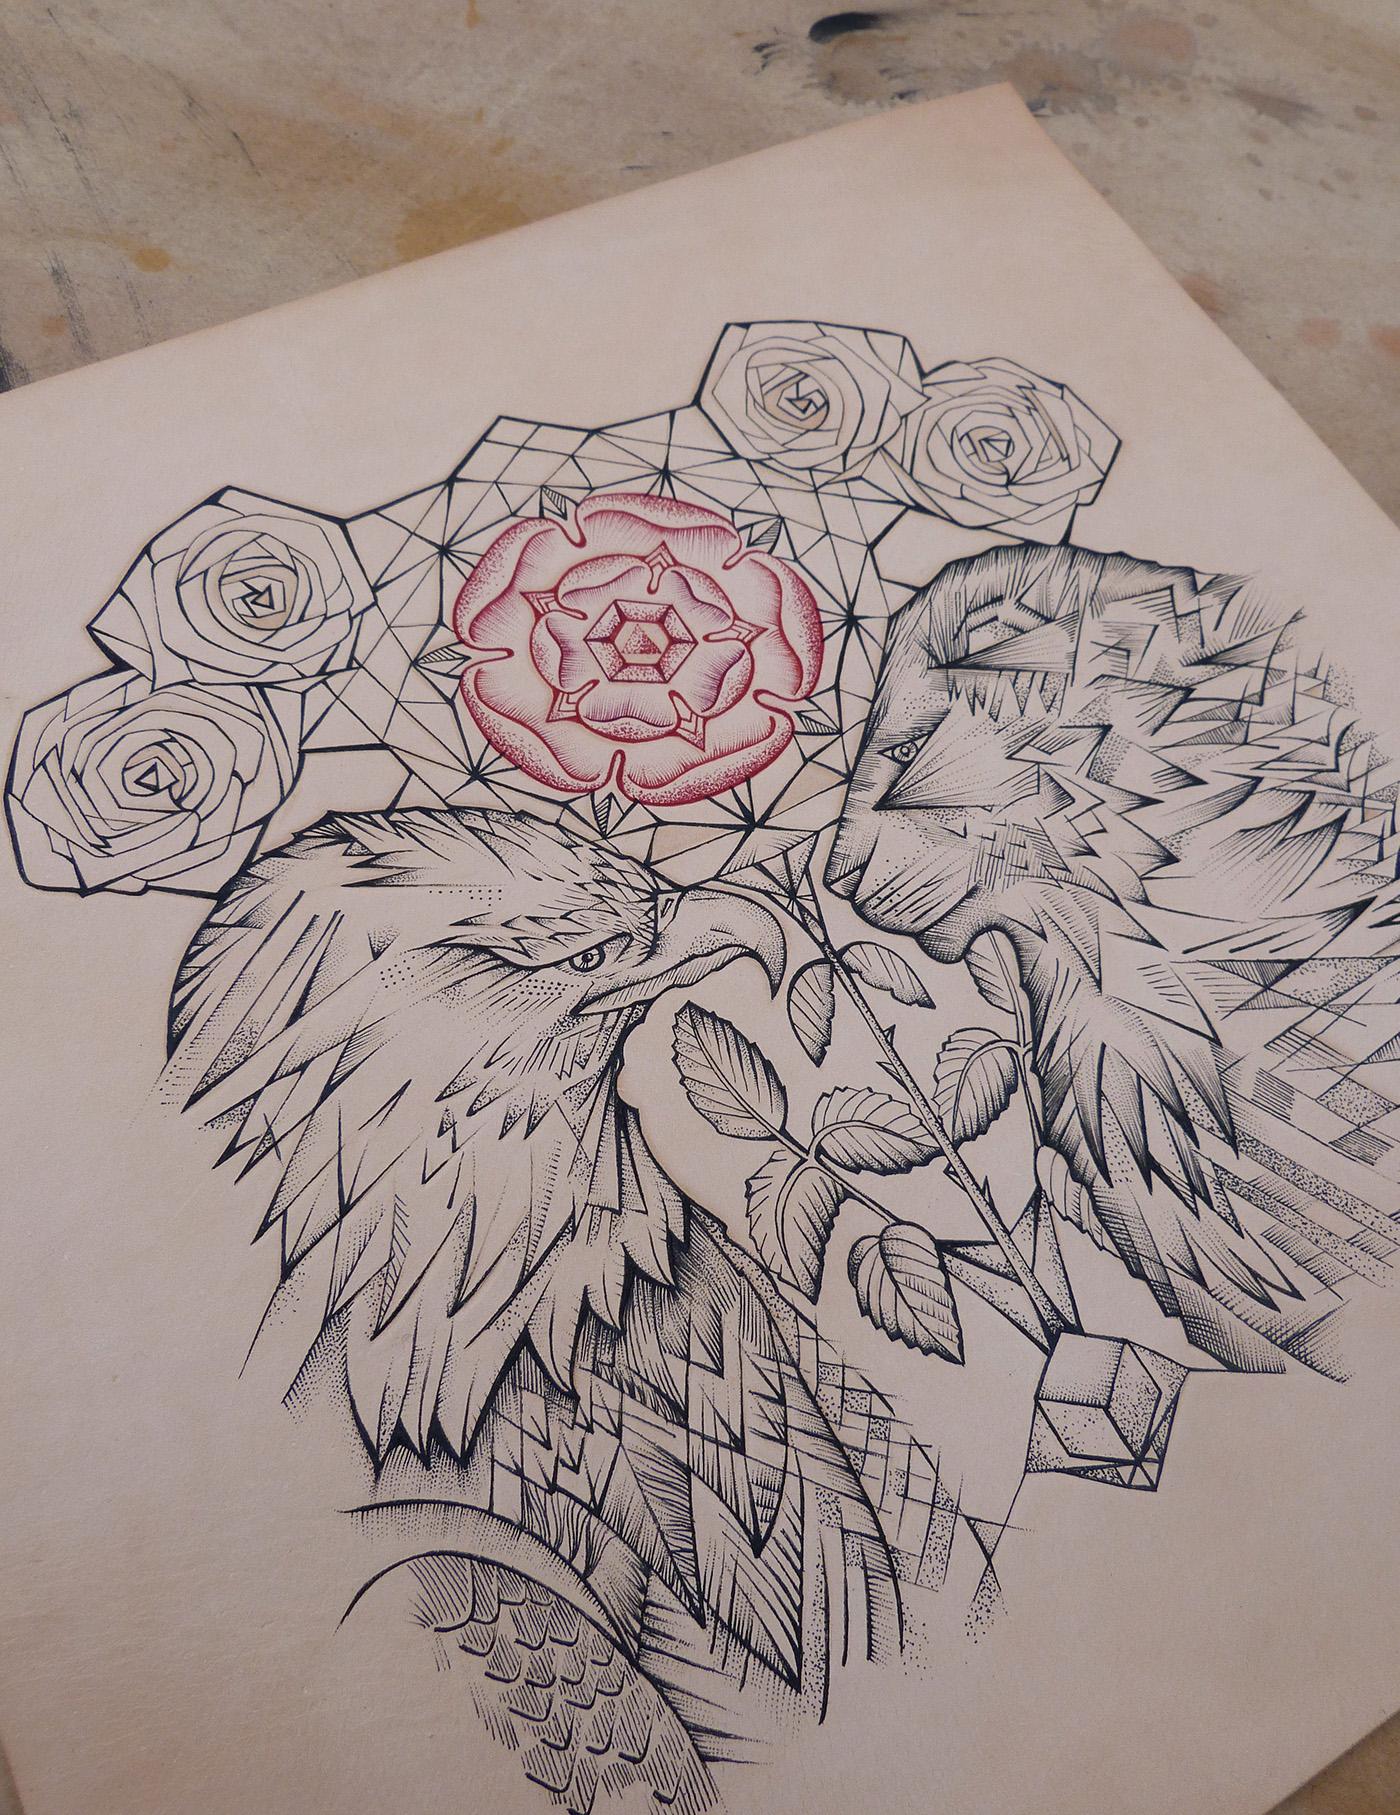 eagle lion tattooed leather art commission piece on behance. Black Bedroom Furniture Sets. Home Design Ideas